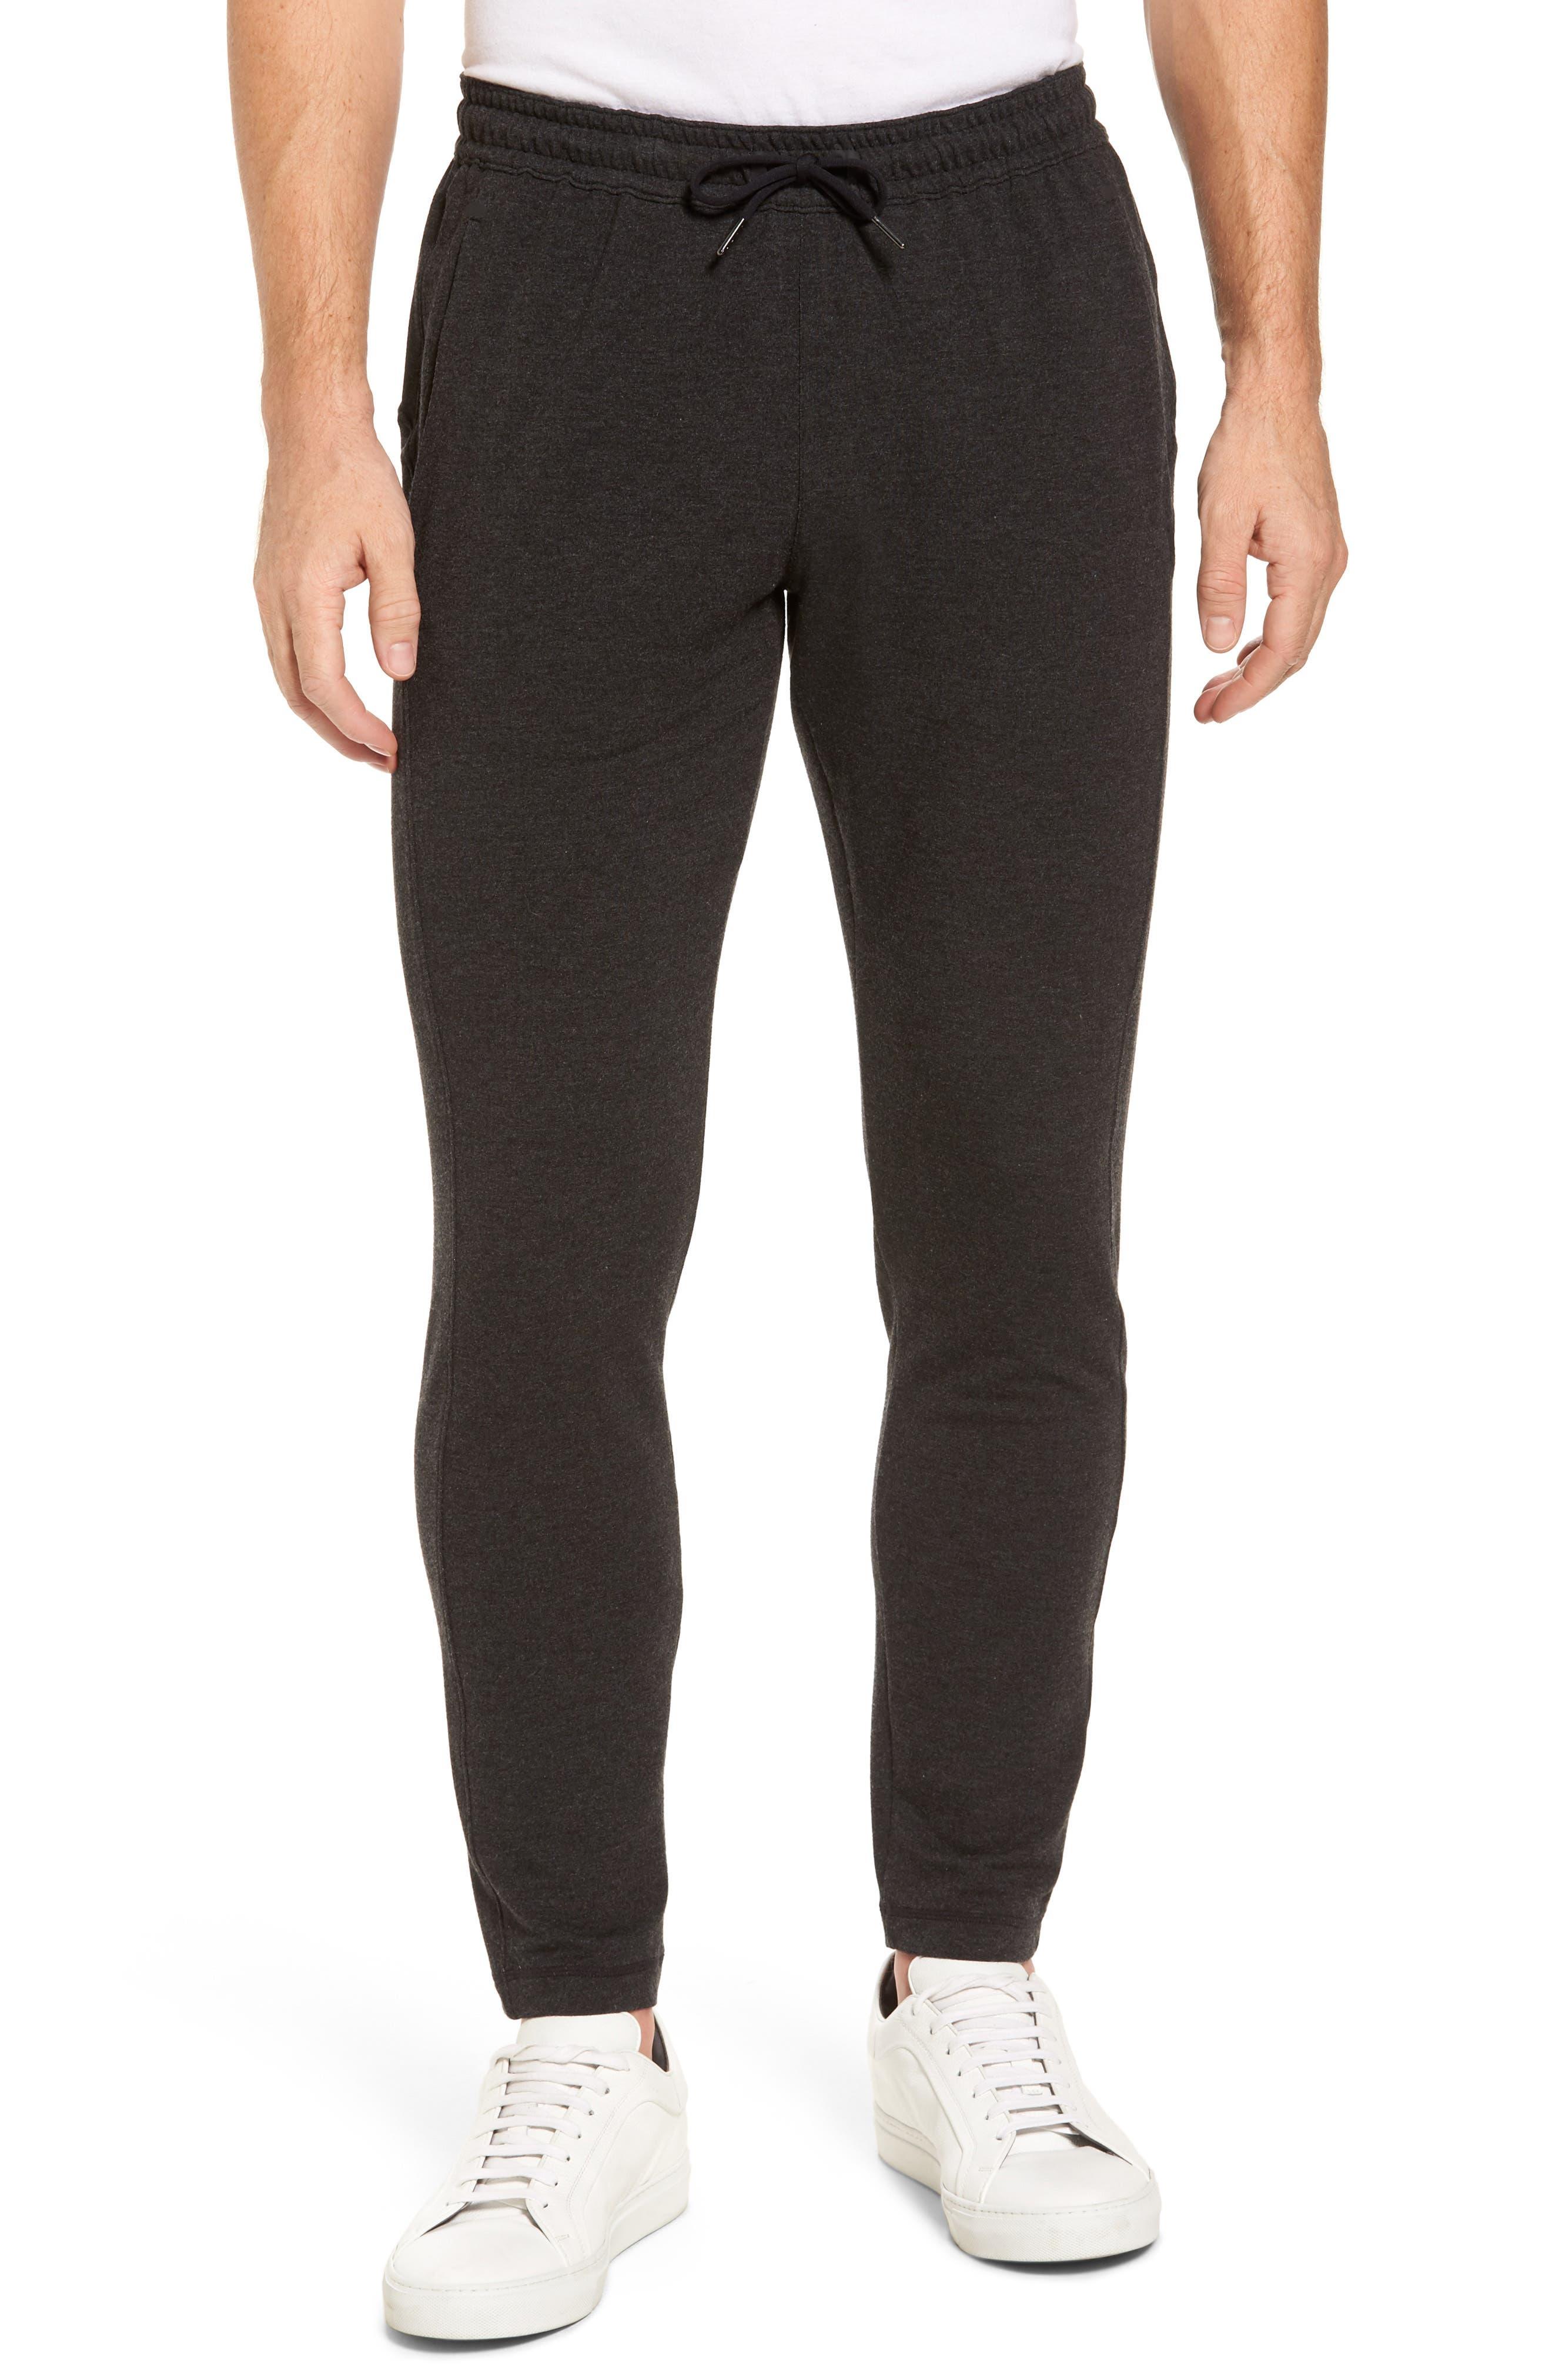 Zella New Pyrite Tapered Fit Fleece Pants